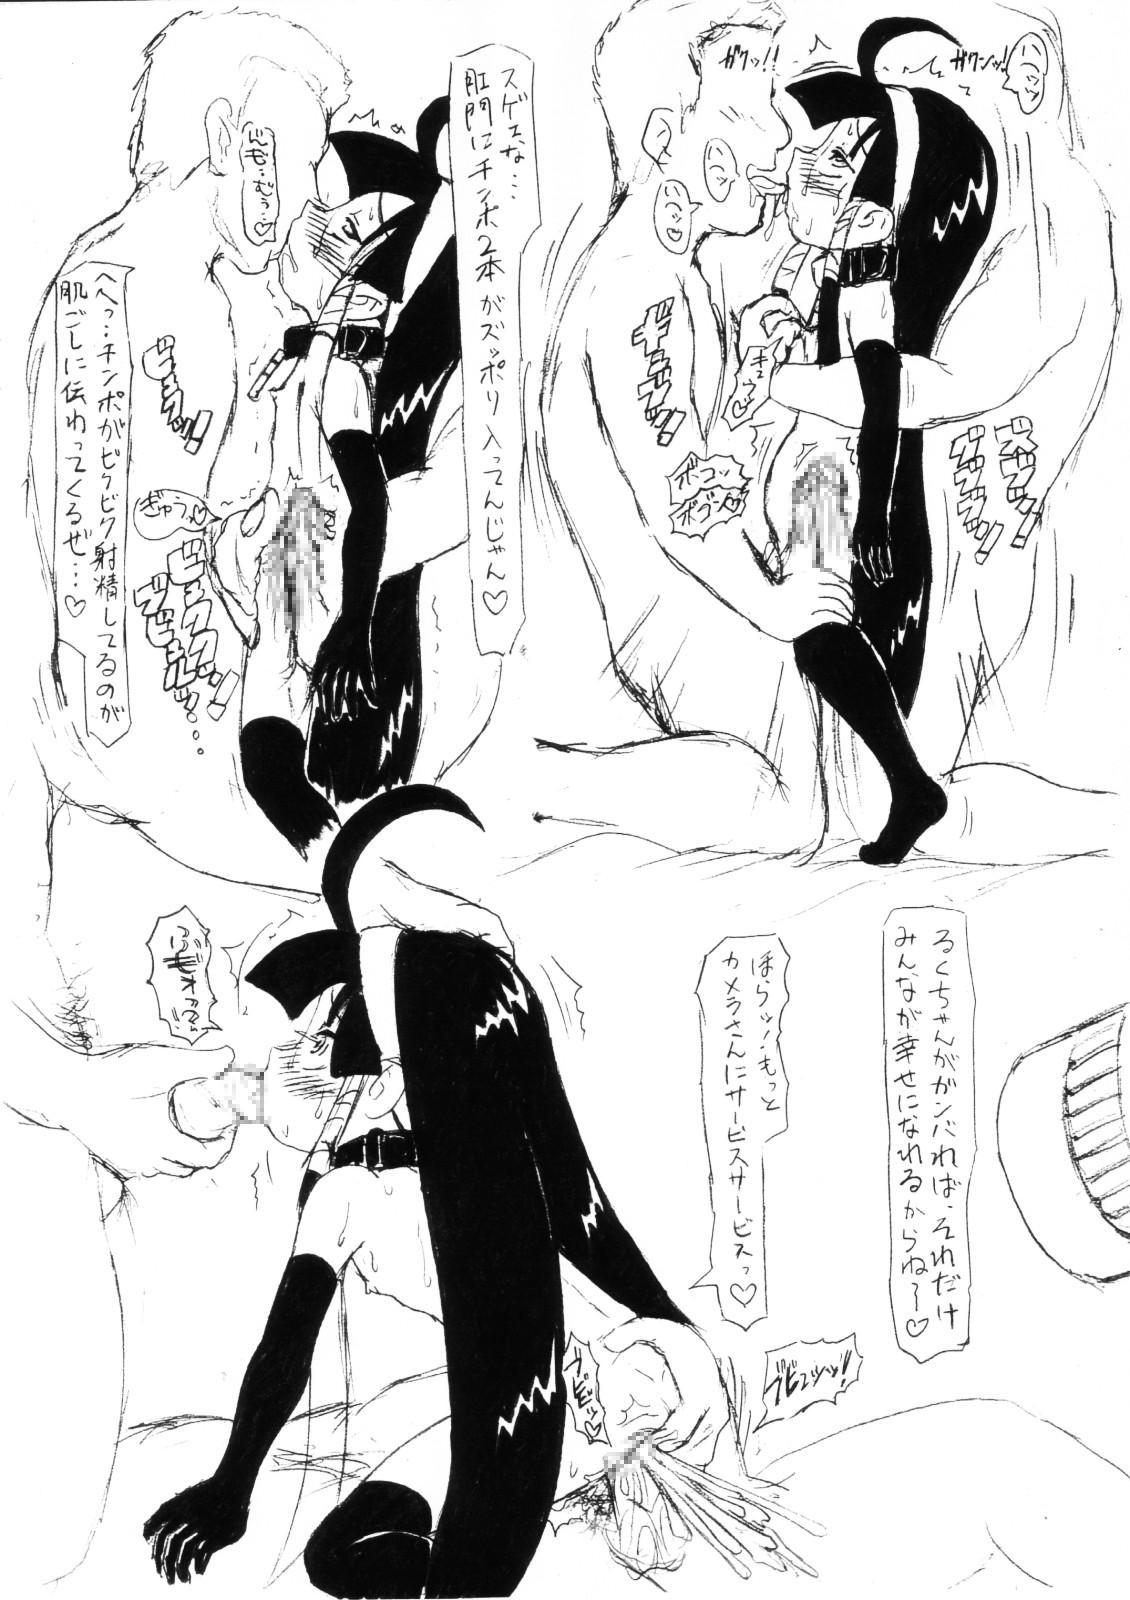 [愚直屋(Spec-R)] (from [FLAT RACING] S30Z) 3